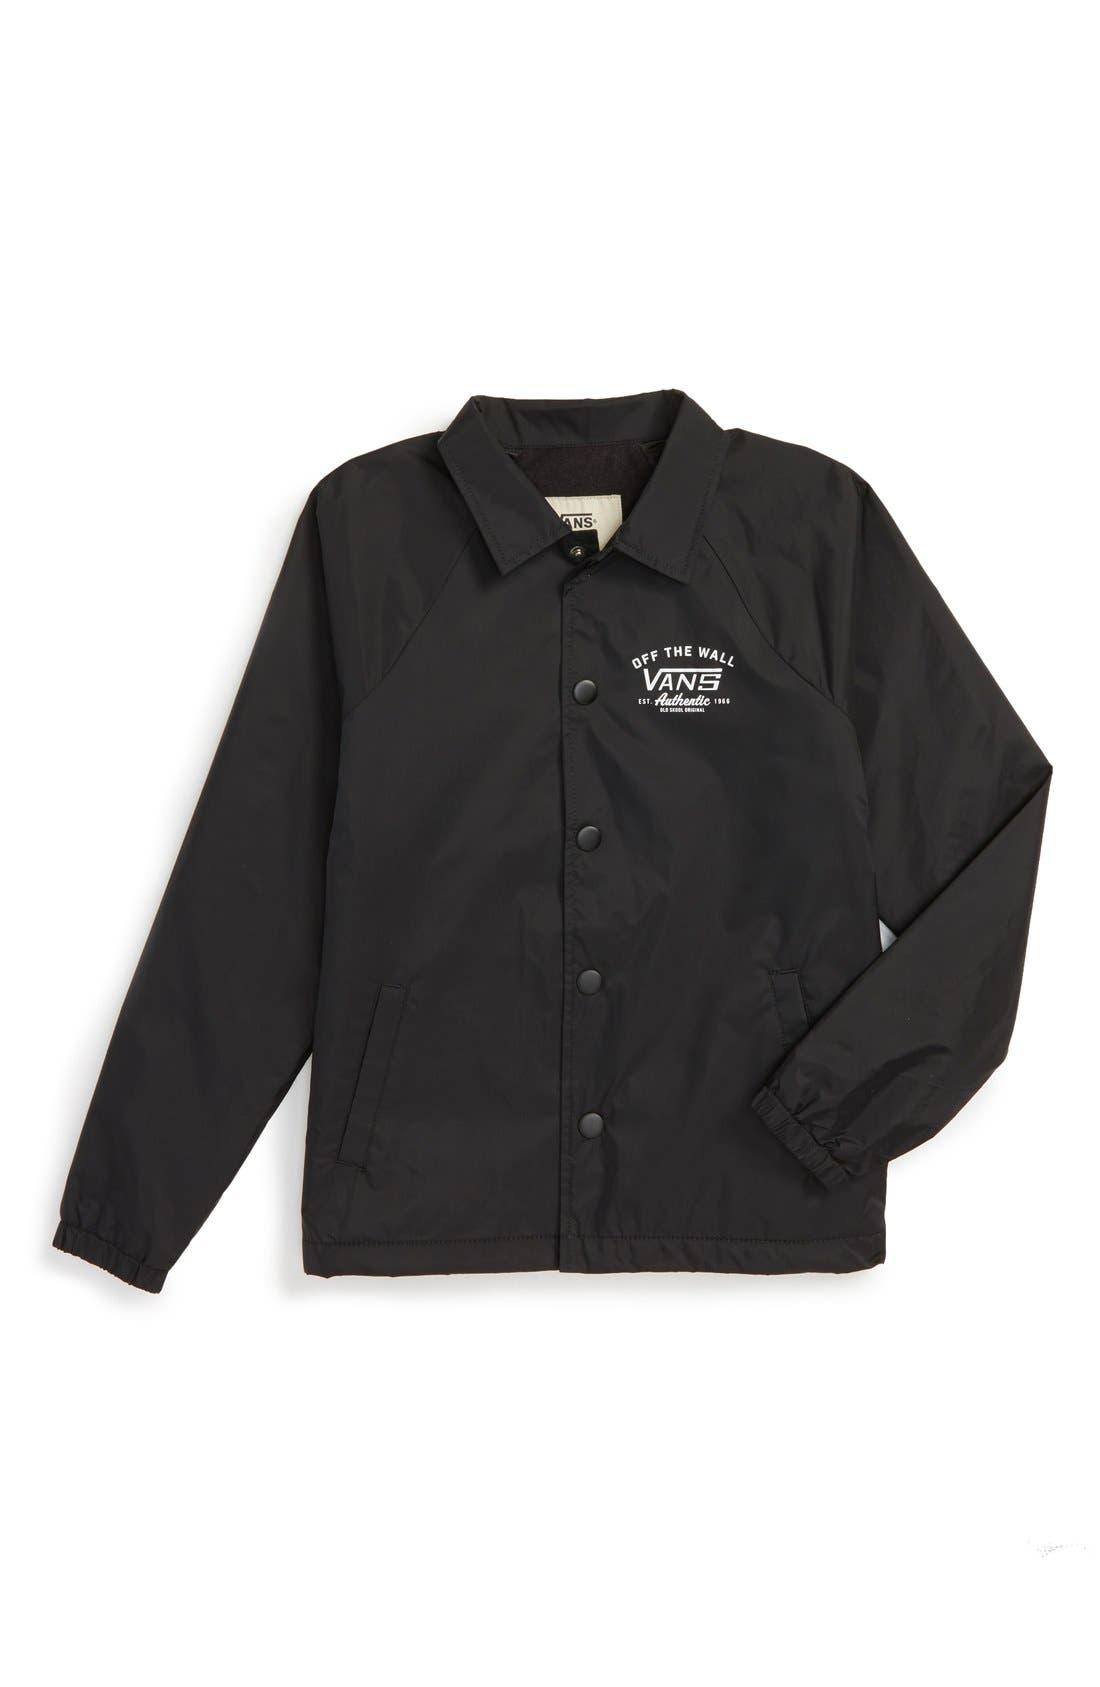 Main Image - Vans 'Torrey' Nylon Jacket (Big Boys)